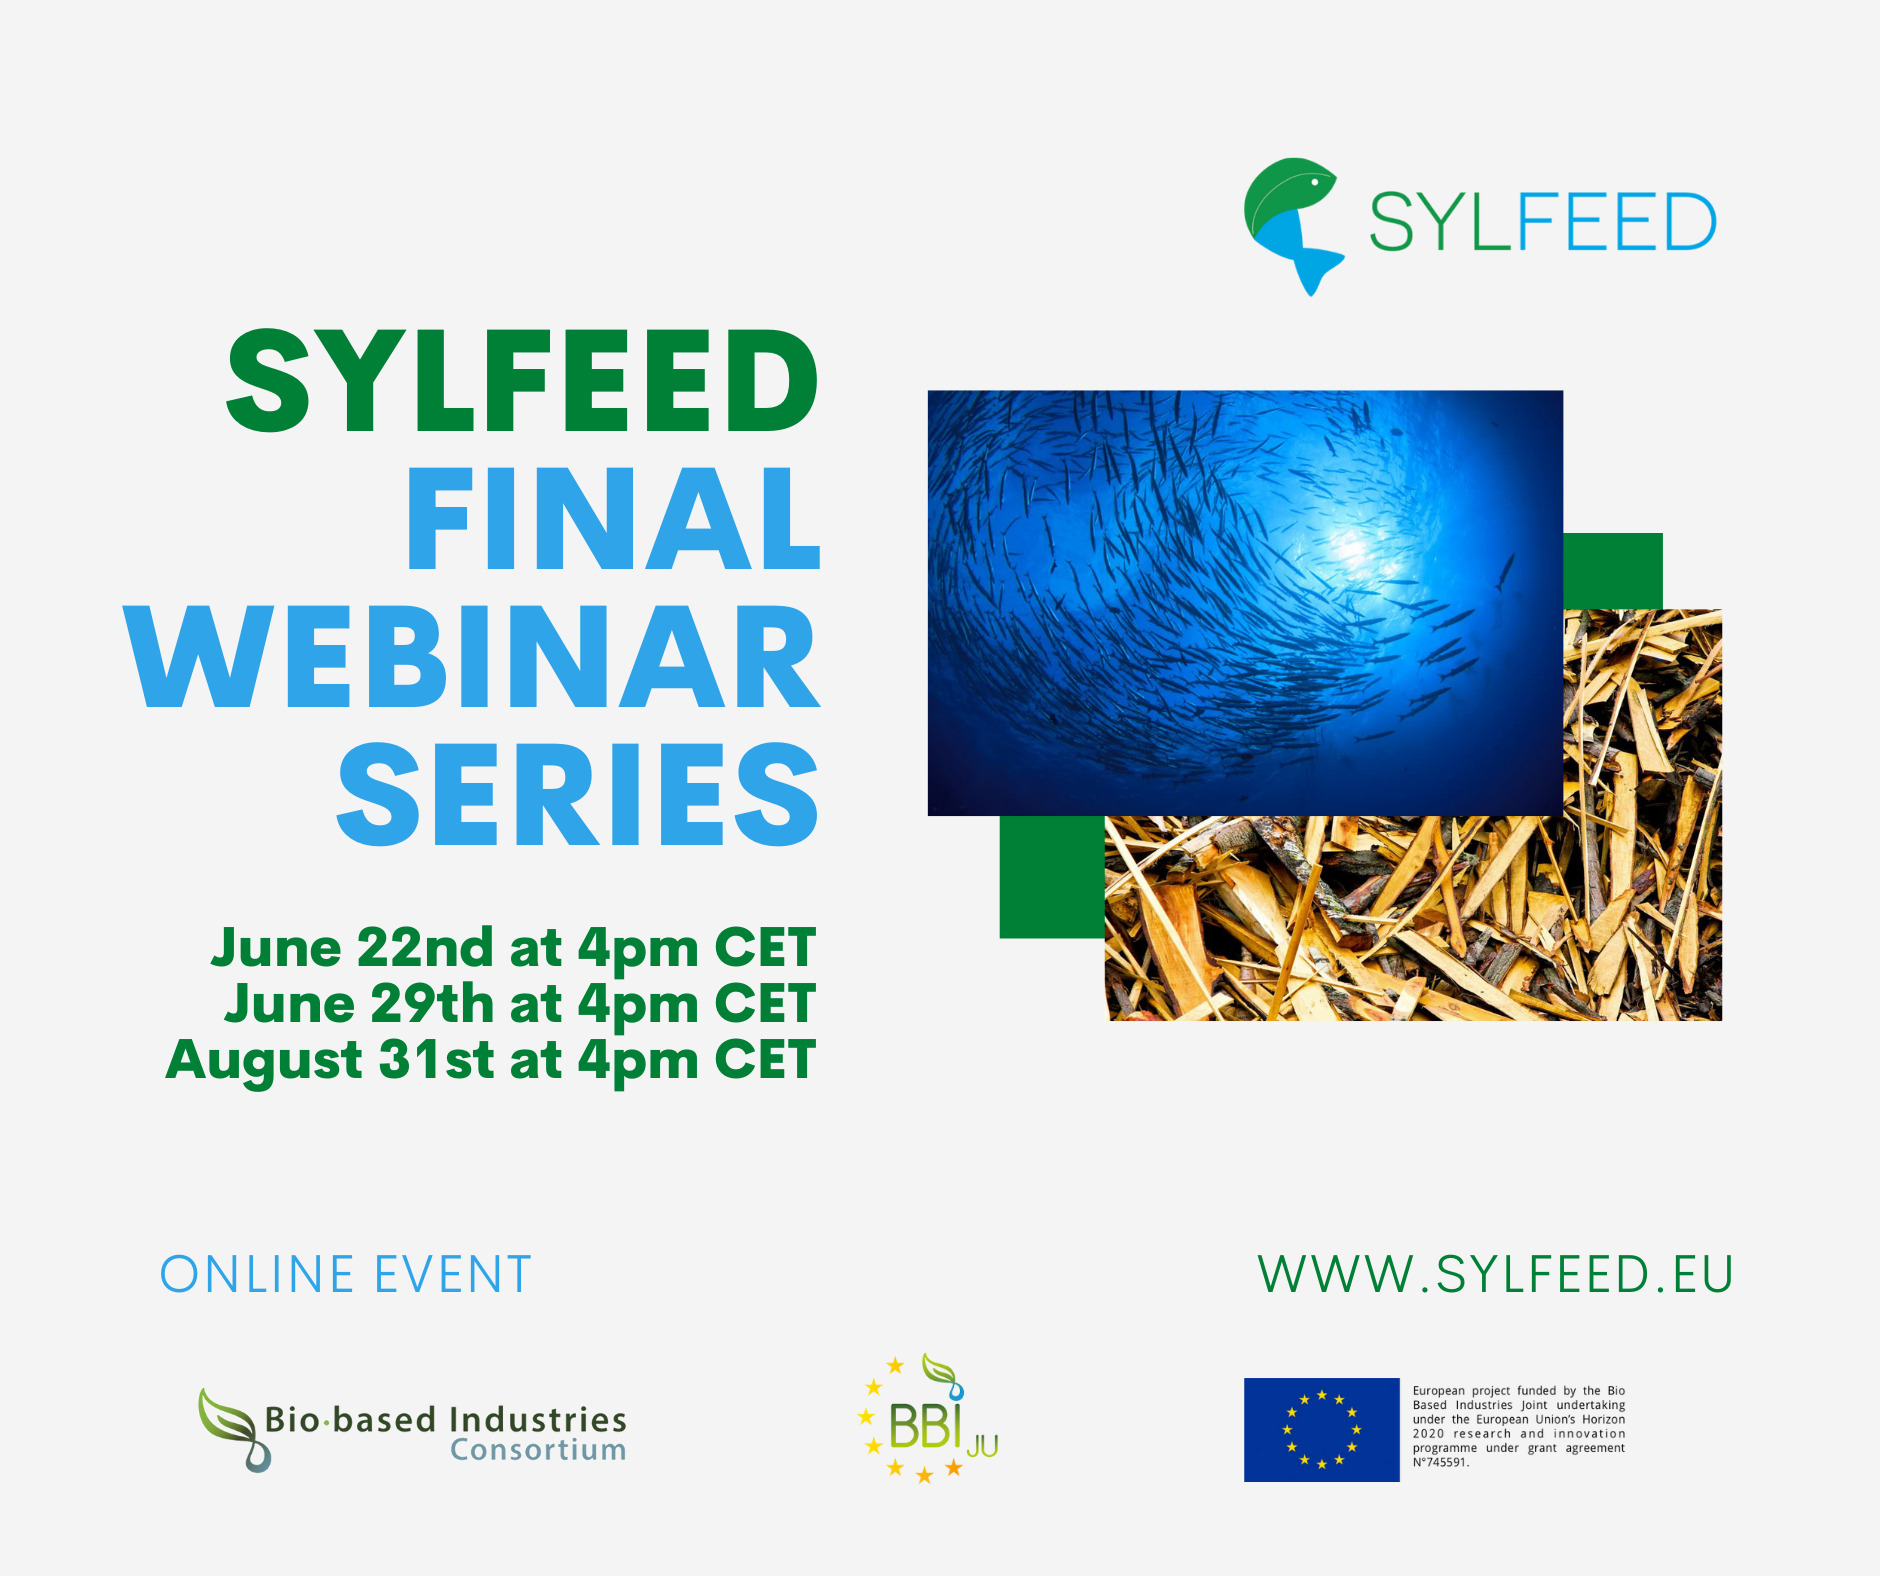 SYLFEED Final Webinar Series Announced